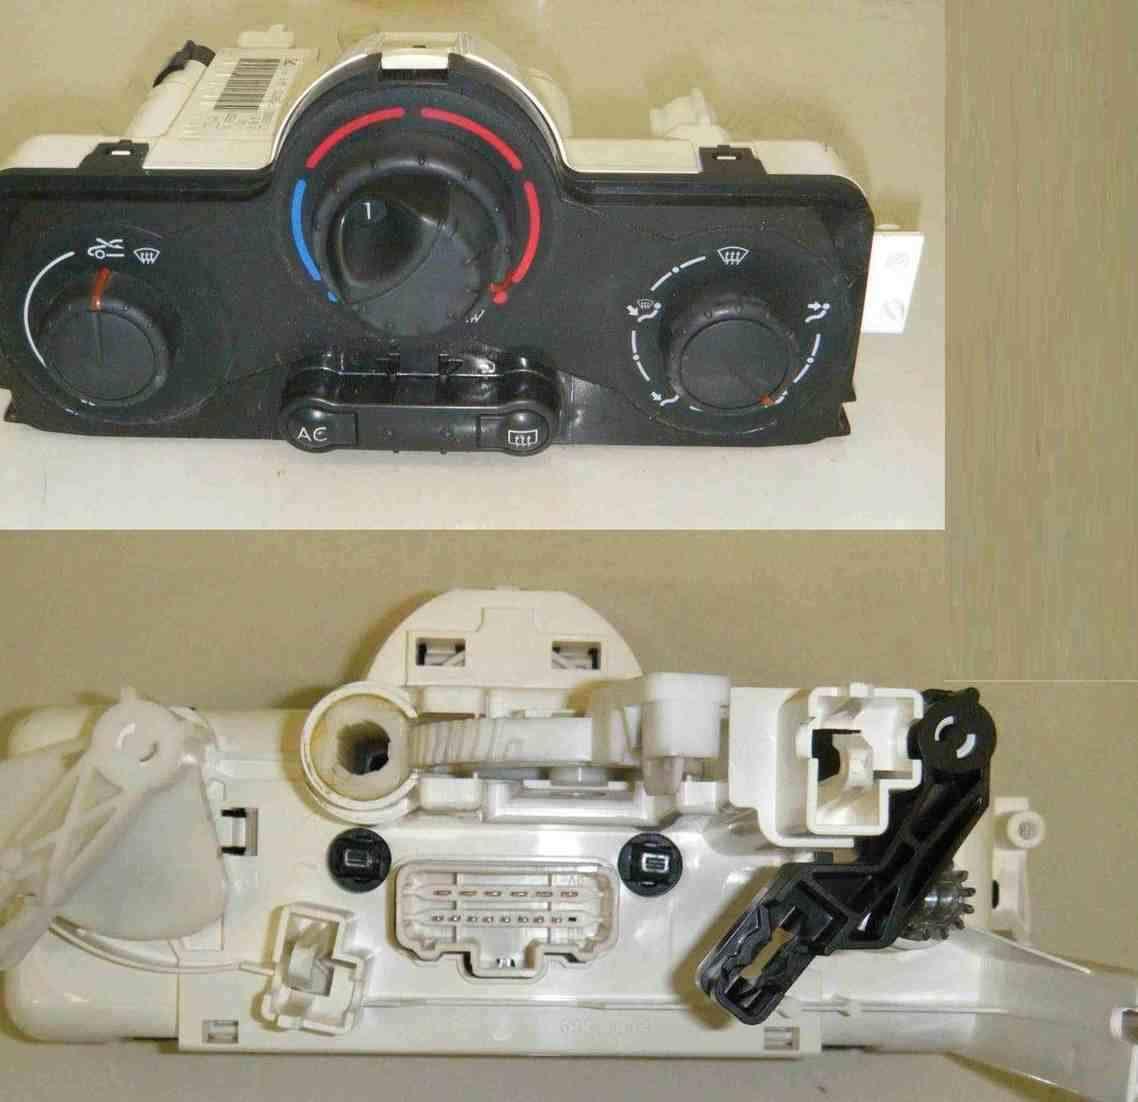 Renault Megane Scenic 2003-2009 Heater Controls Unit AC Aircon Dials 69580001